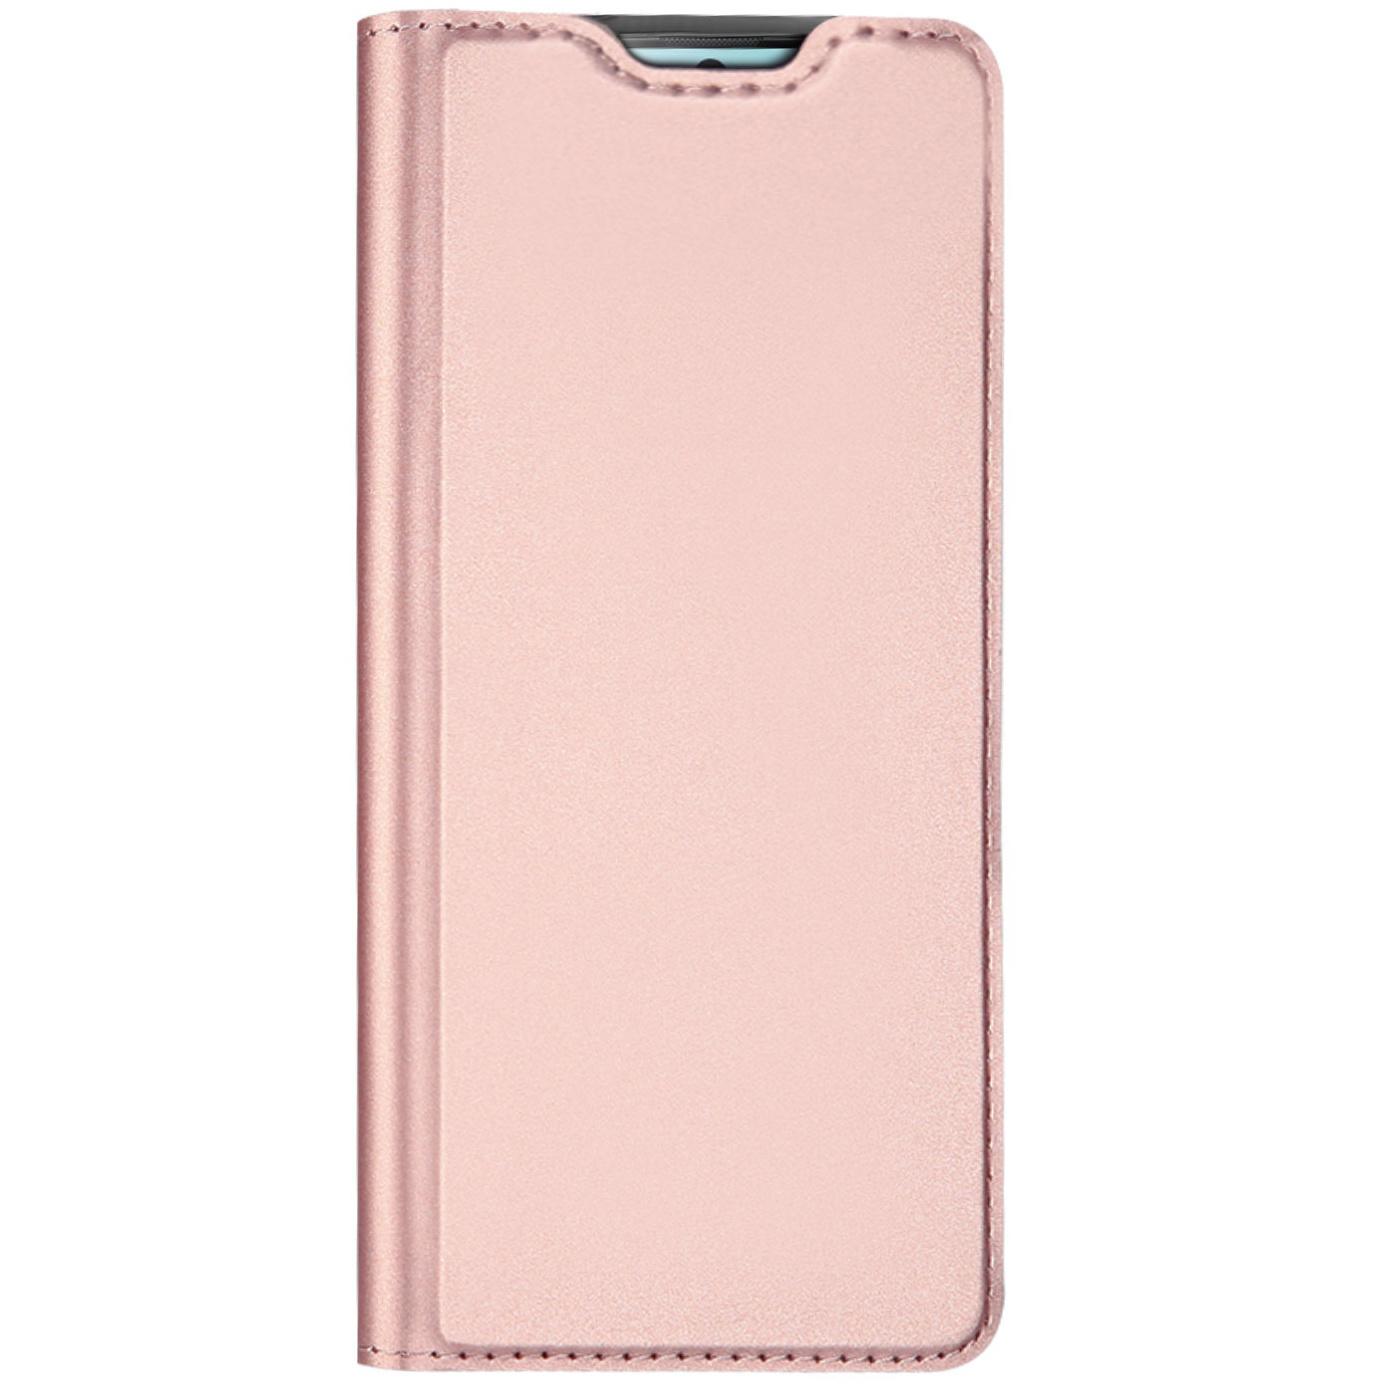 Dux Ducis Slim Softcase Booktype Samsung Galaxy S10 Lite - Rosé Goud